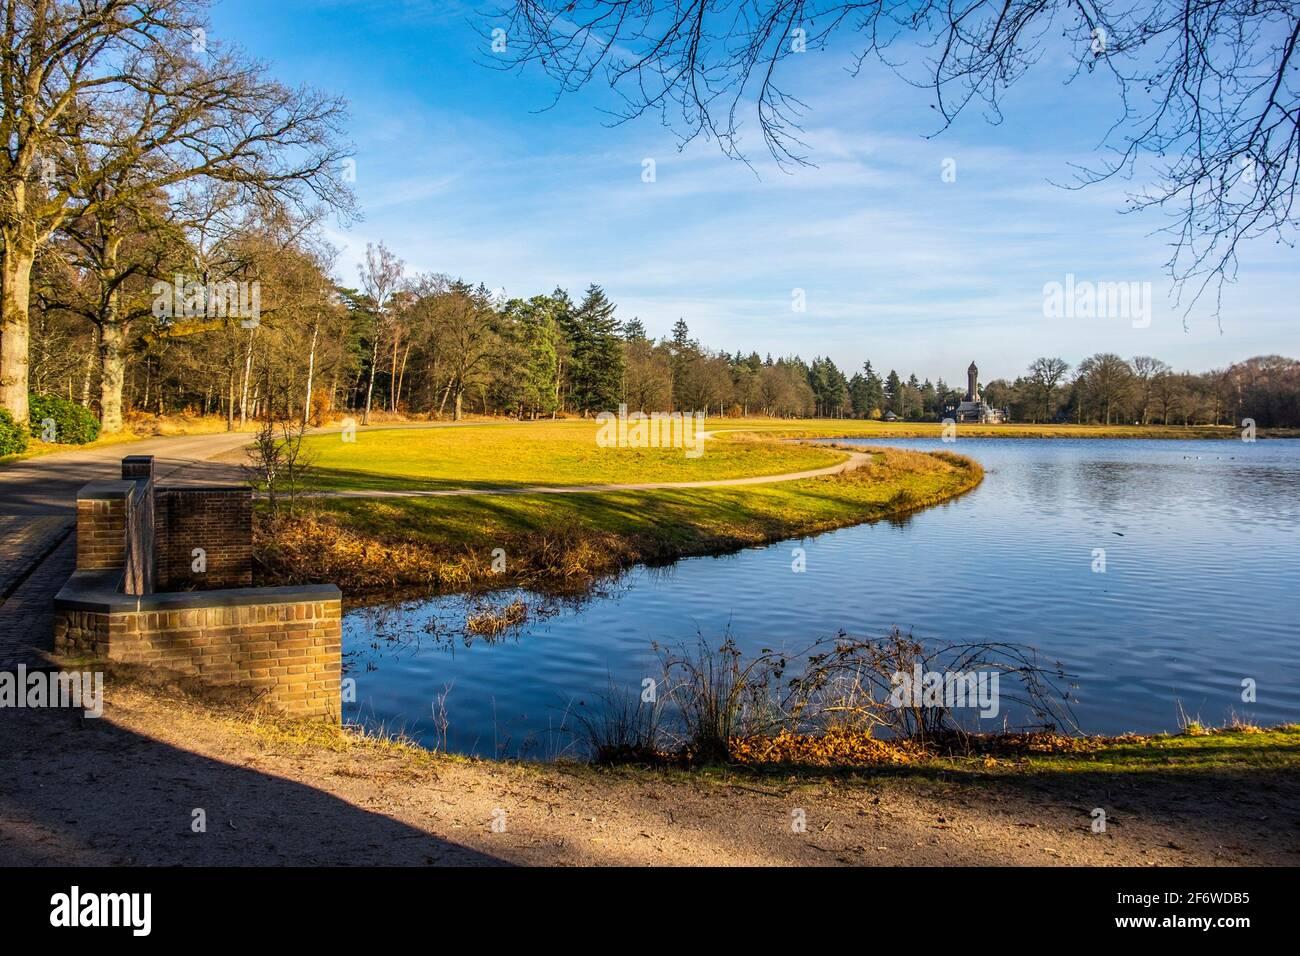 Jachthuis Saint Hubertus, National Park Hoge Veluwe, Gelderland, The Netherlands, Europe. Stock Photo